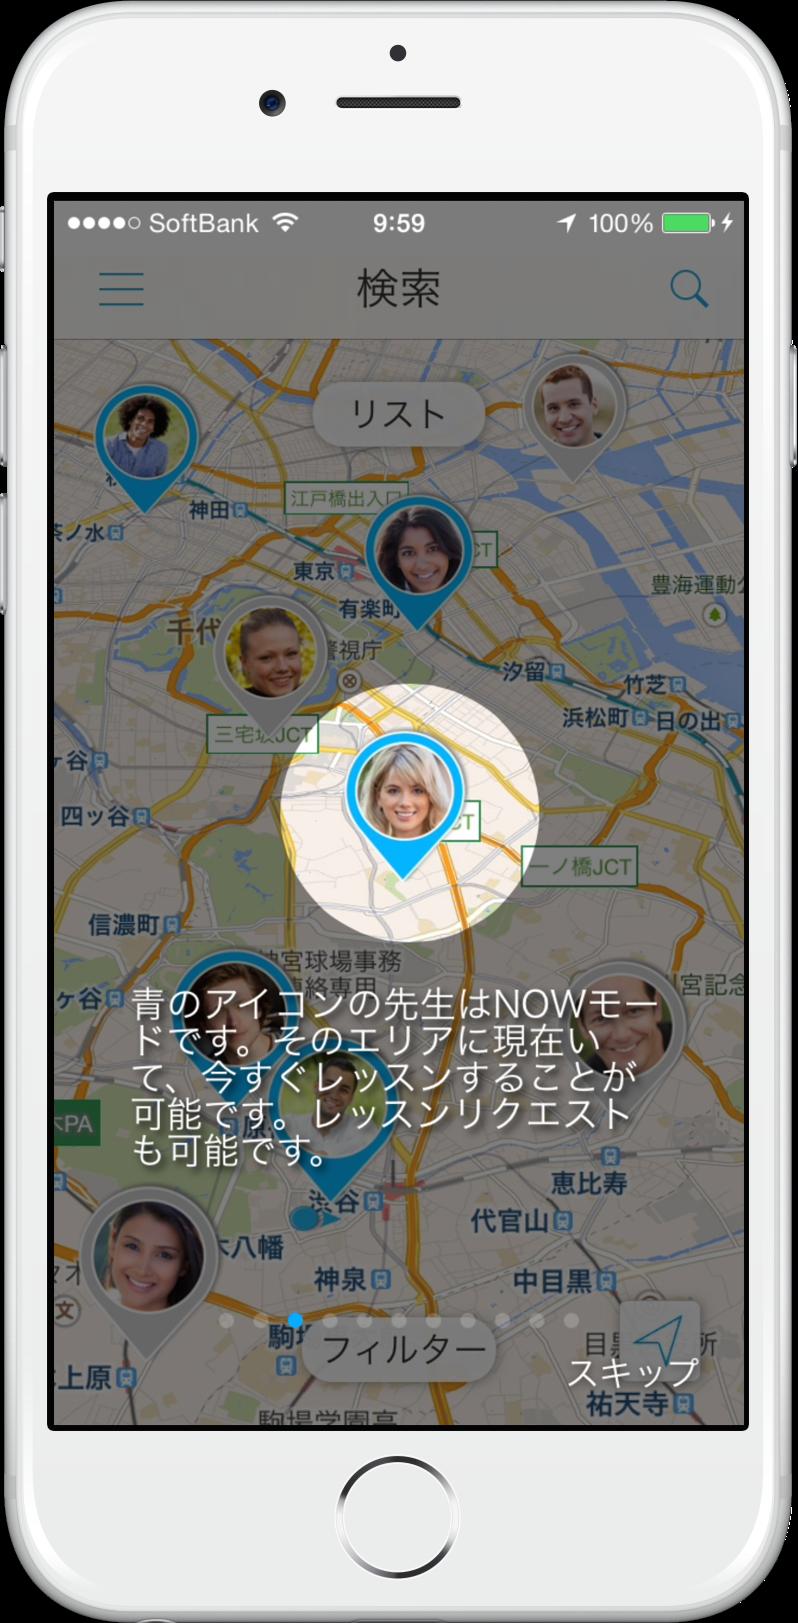 eikaiwaNOW - レッスンの流れ - JPN - 2_iphone6_silver_portrait.png